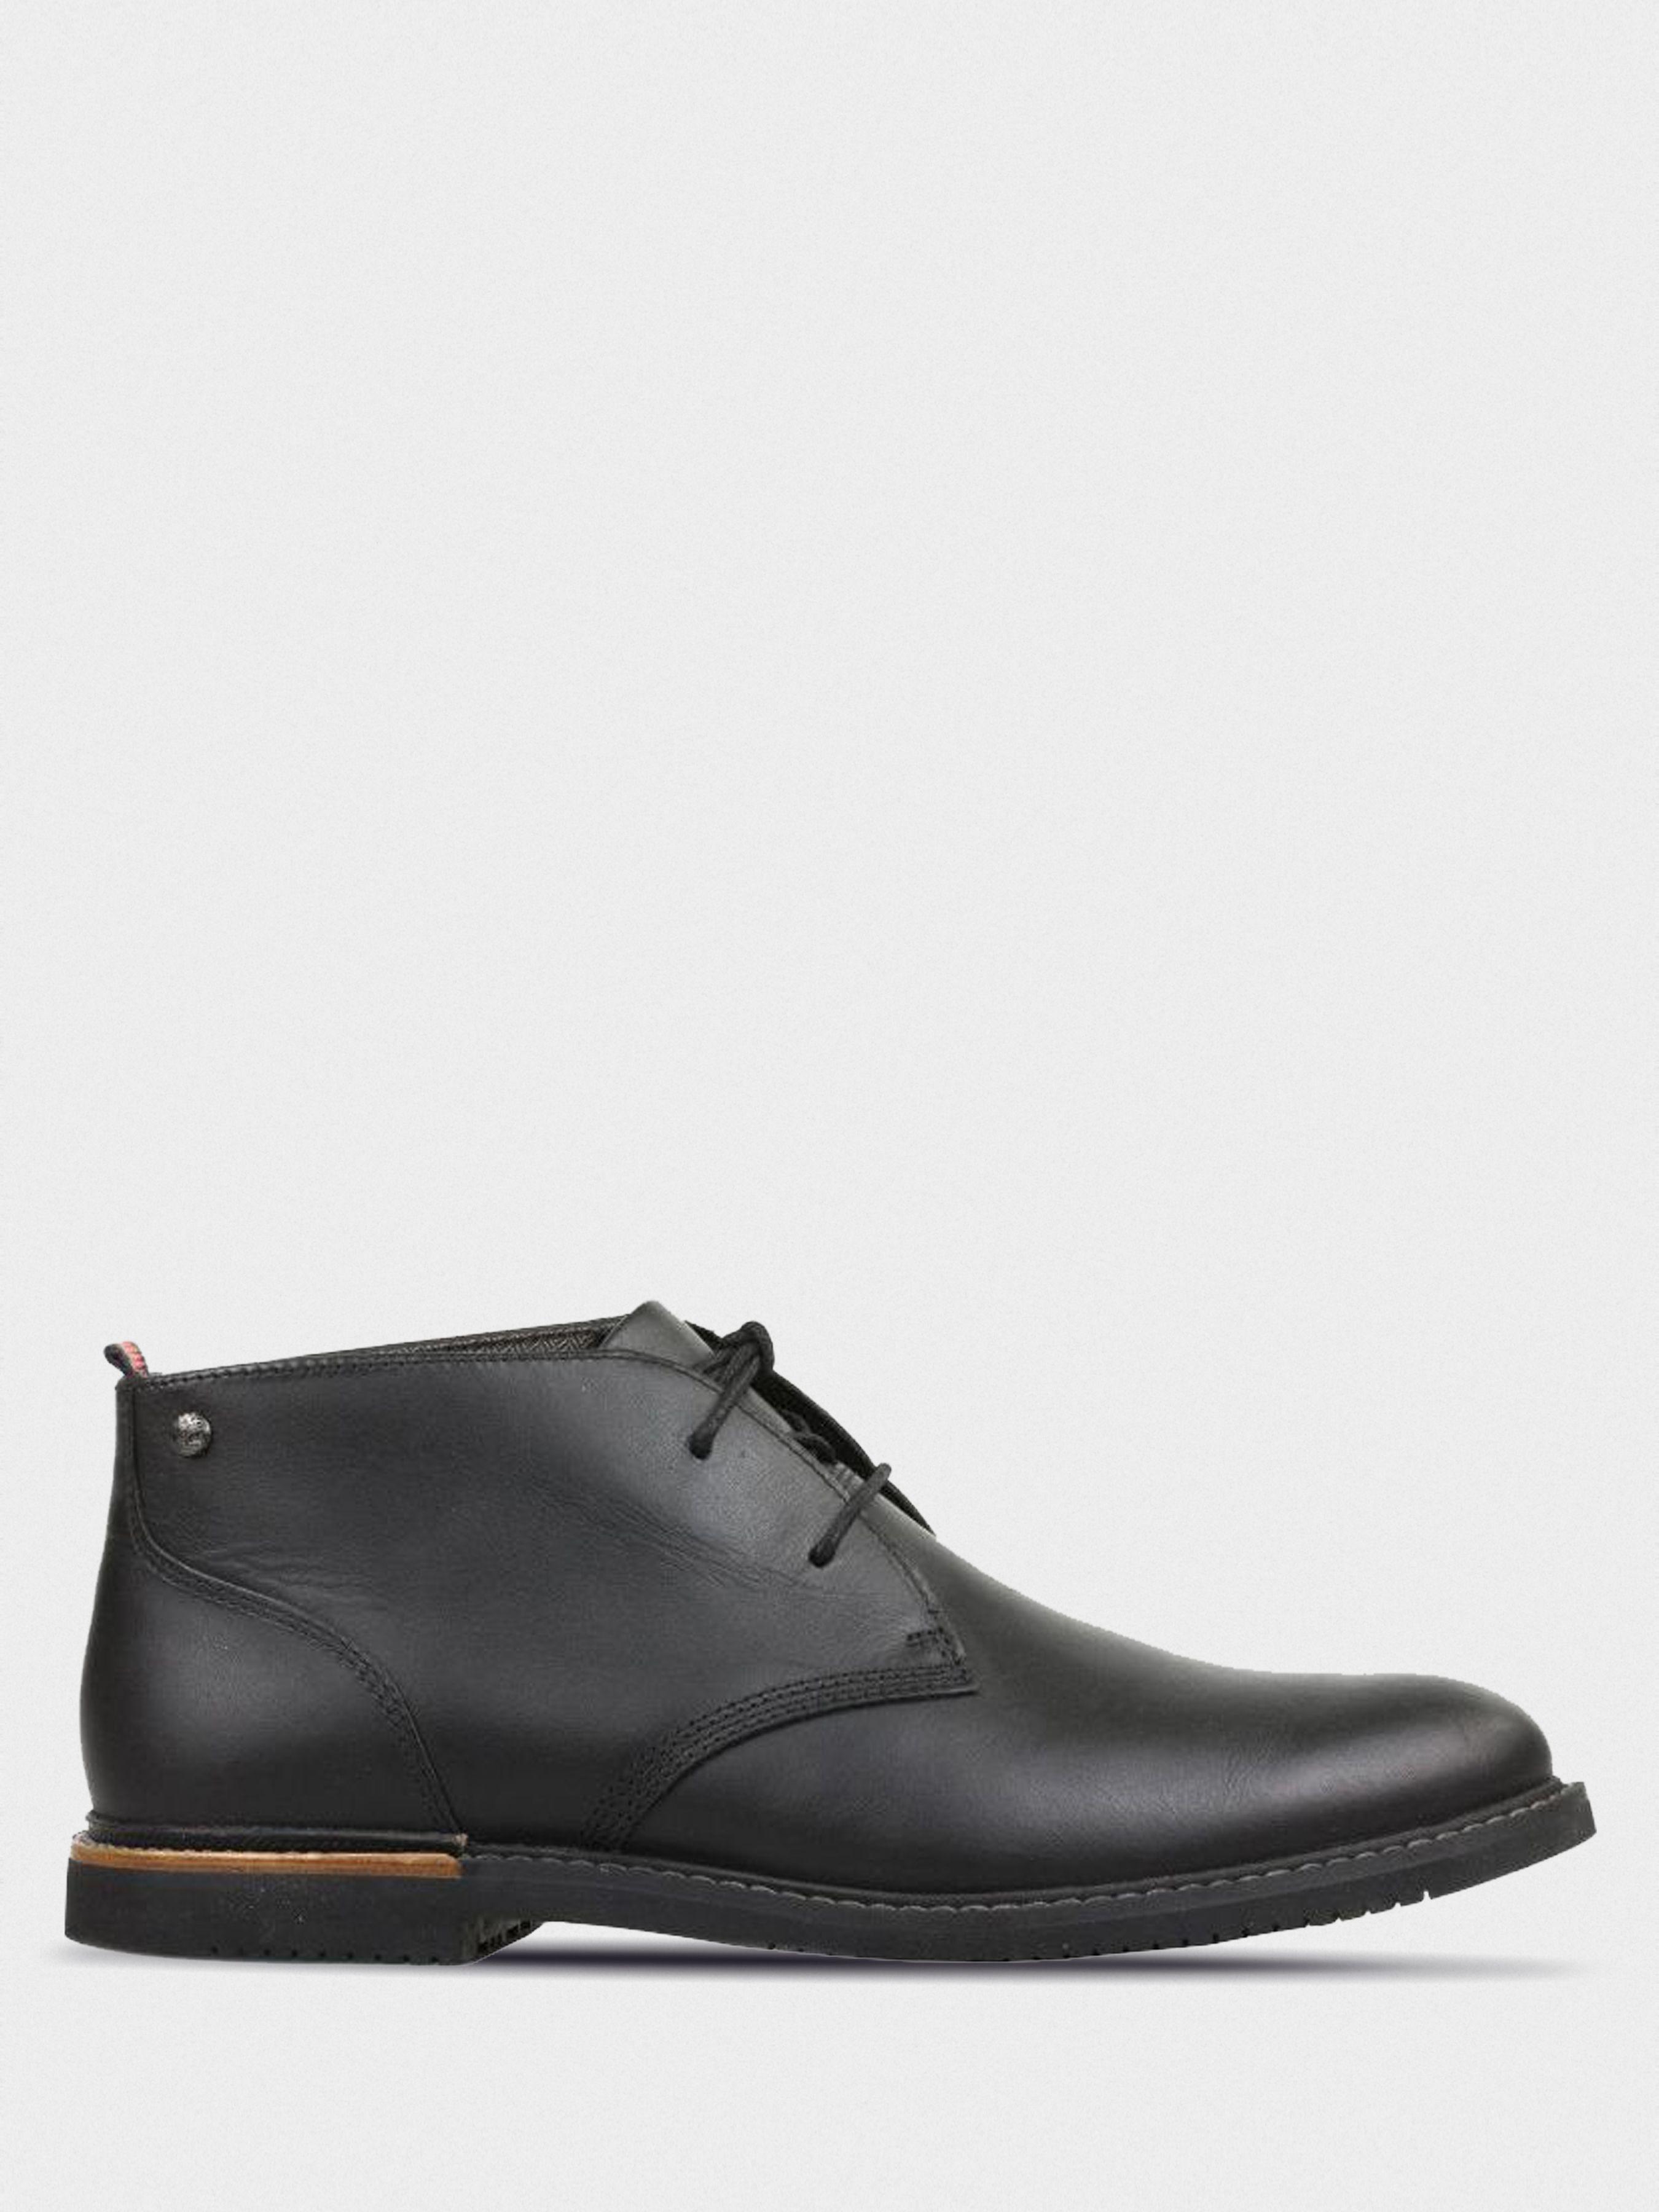 Ботинки для мужчин Timberland Brook Park KHukka TF3281 брендовая обувь, 2017